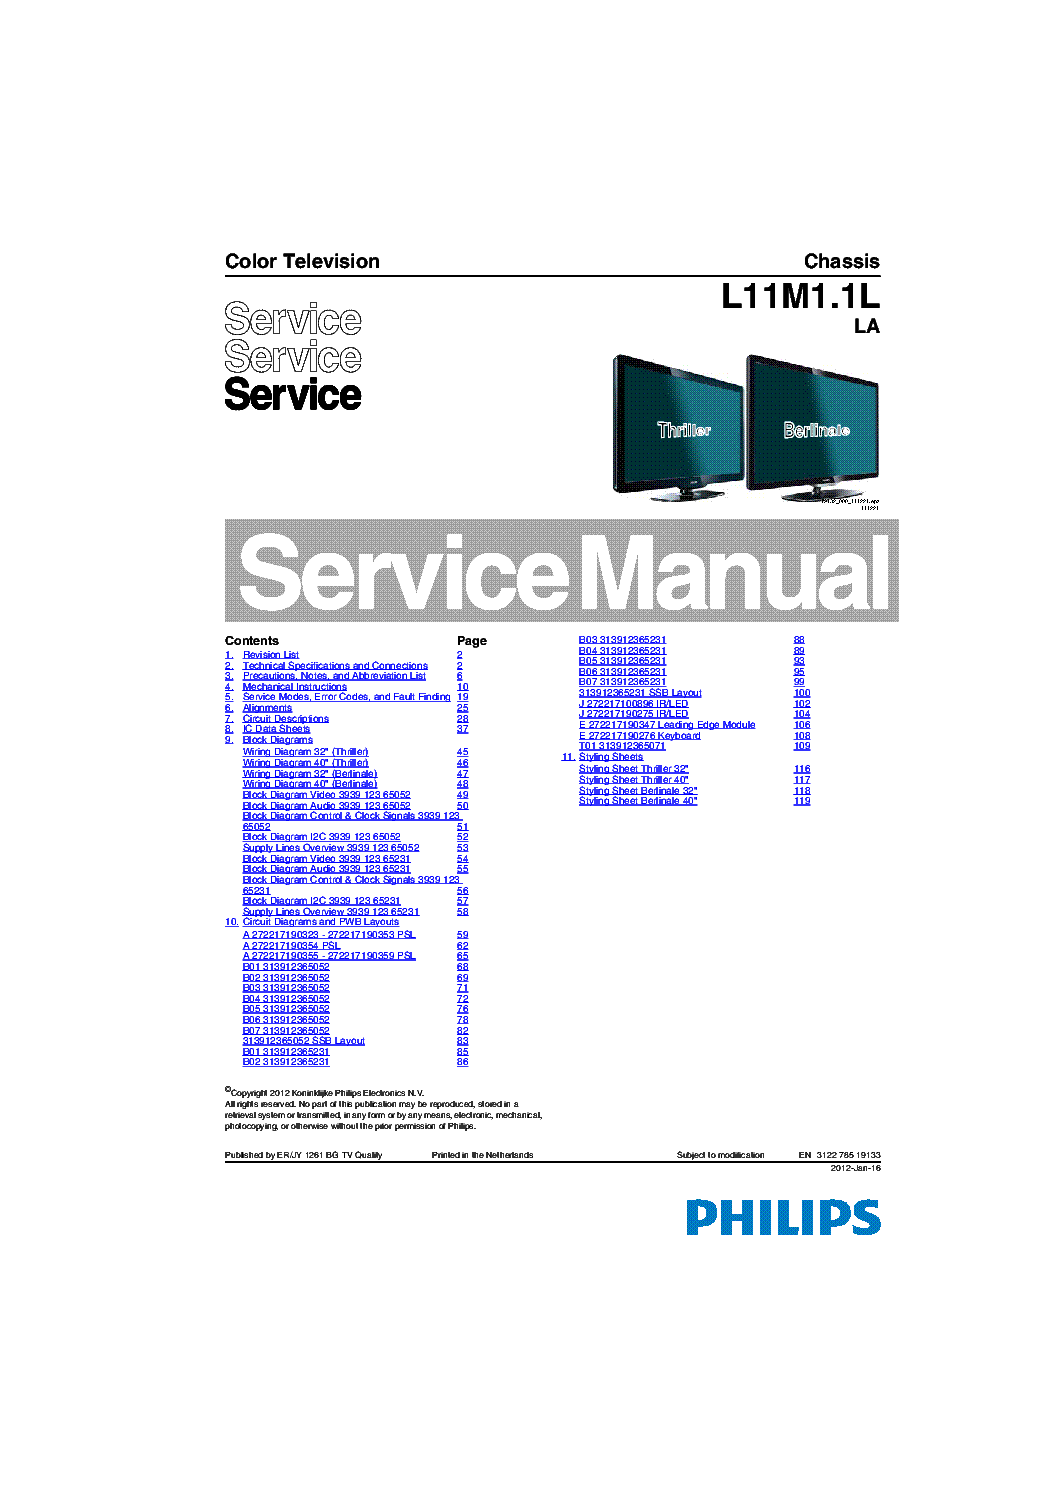 Philips 32pfl3406d 40pfl3406d Chassis L11m1 1lla 312278519133 Service Manual Download